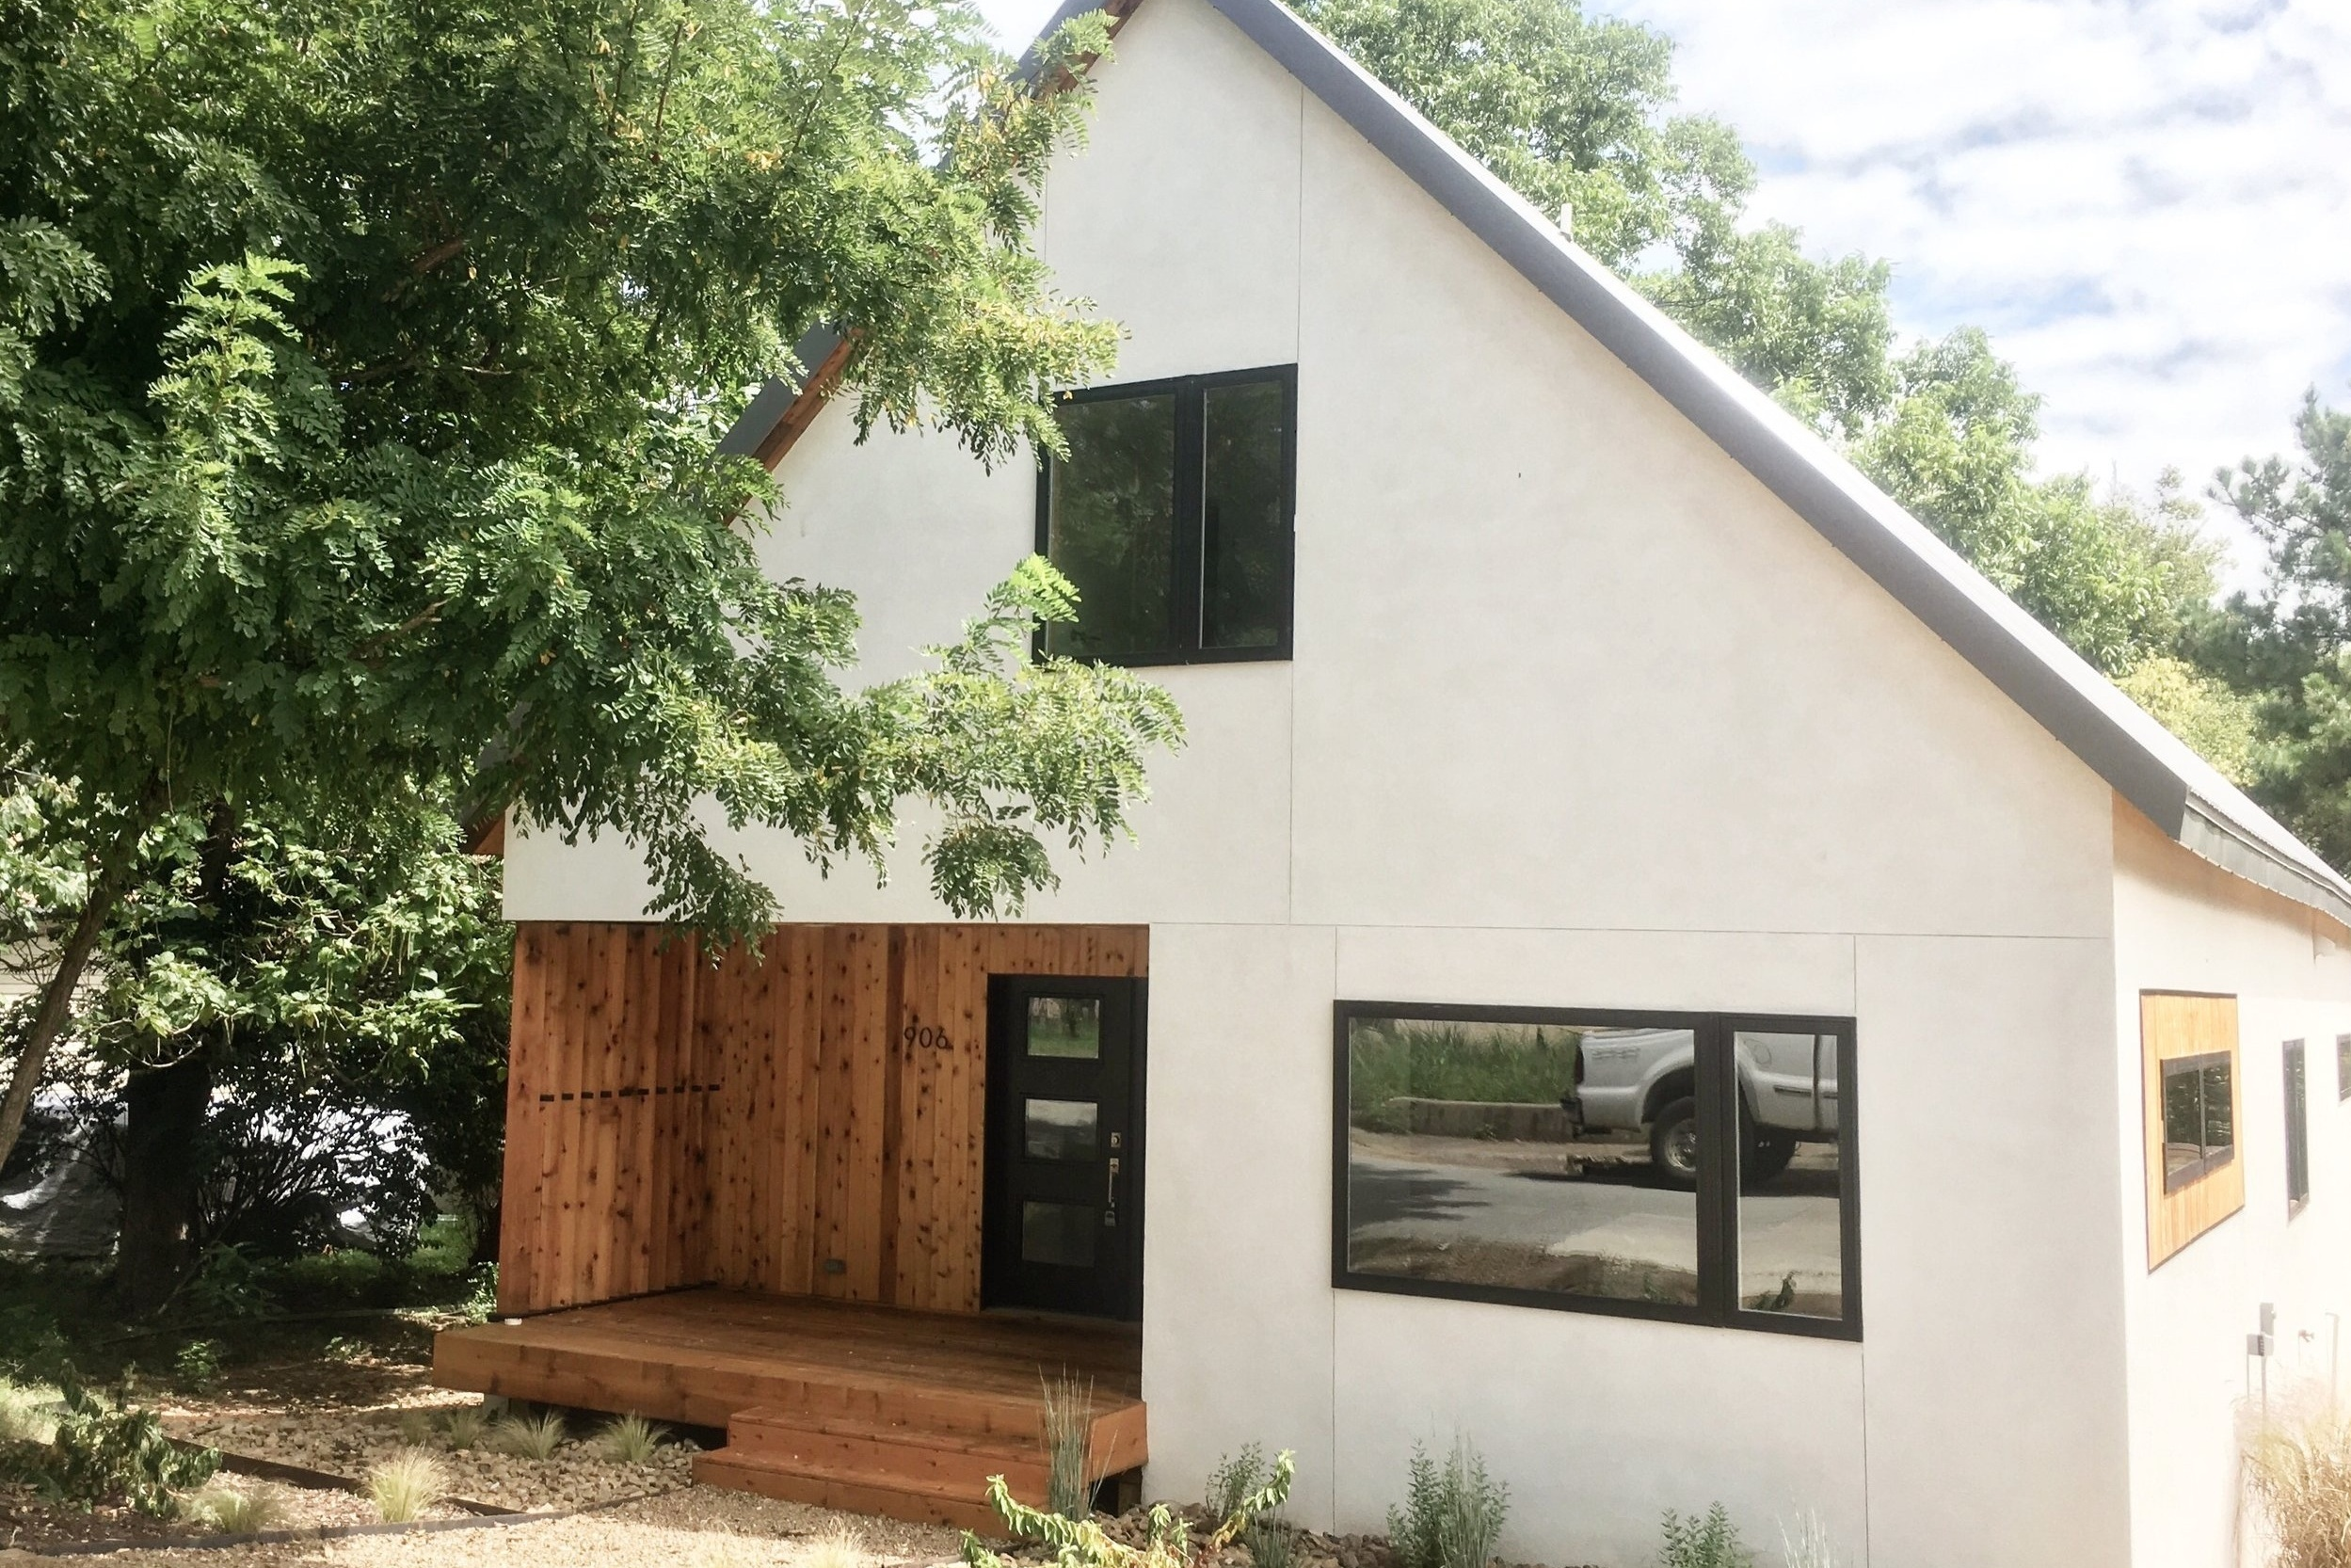 Washington Ave - Design-build spec